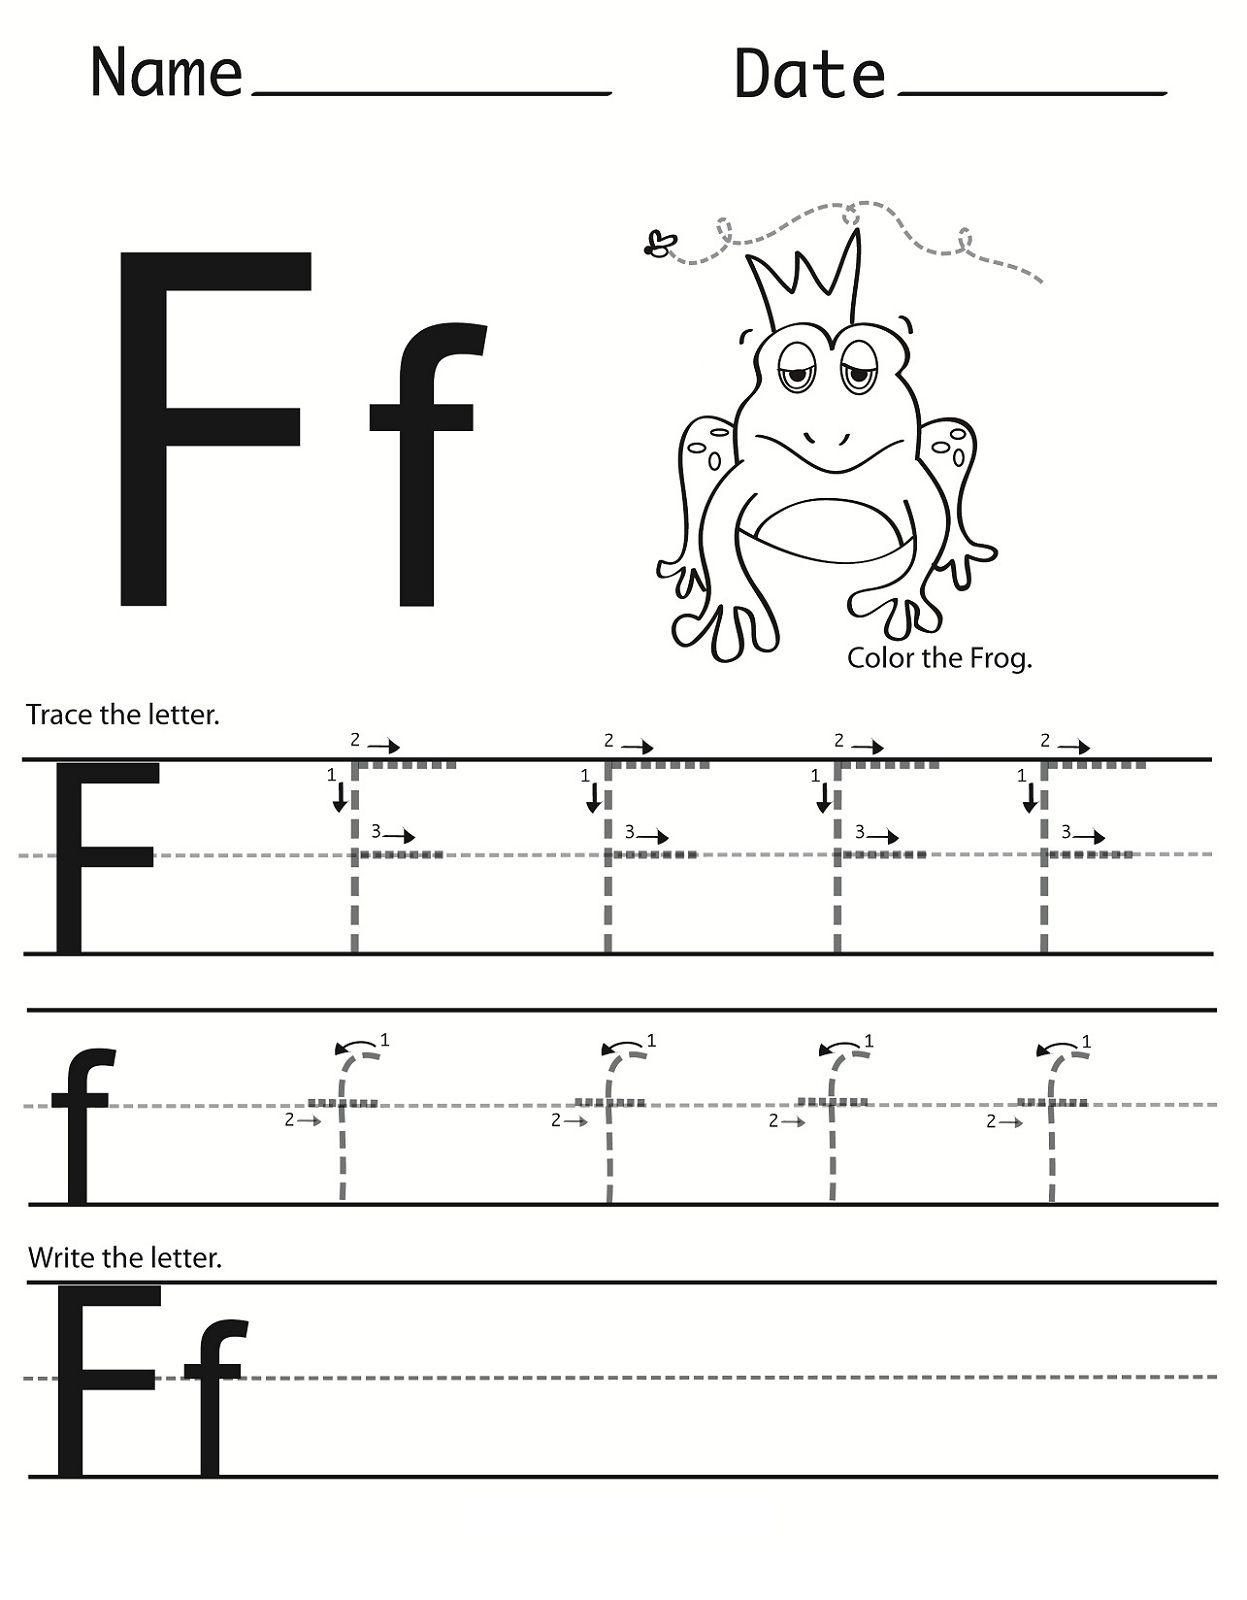 Letter F Worksheet For Preschool And Kindergarten